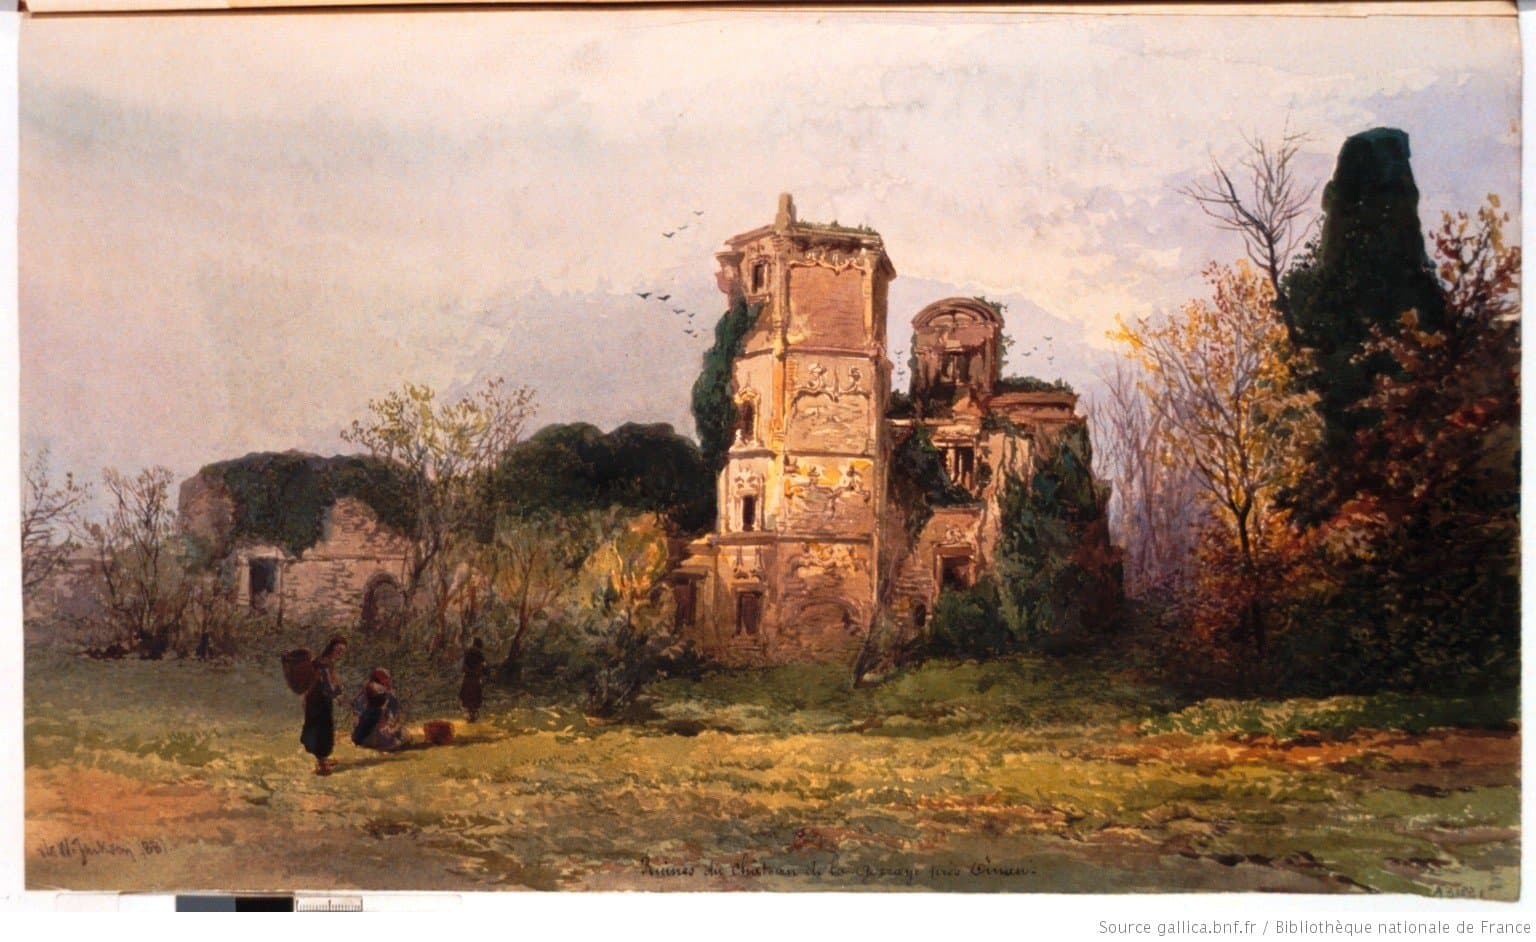 [Ruines_du_chвteau_de_la_[...]Jackson_Frederick_btv1b7741661r.JPEG